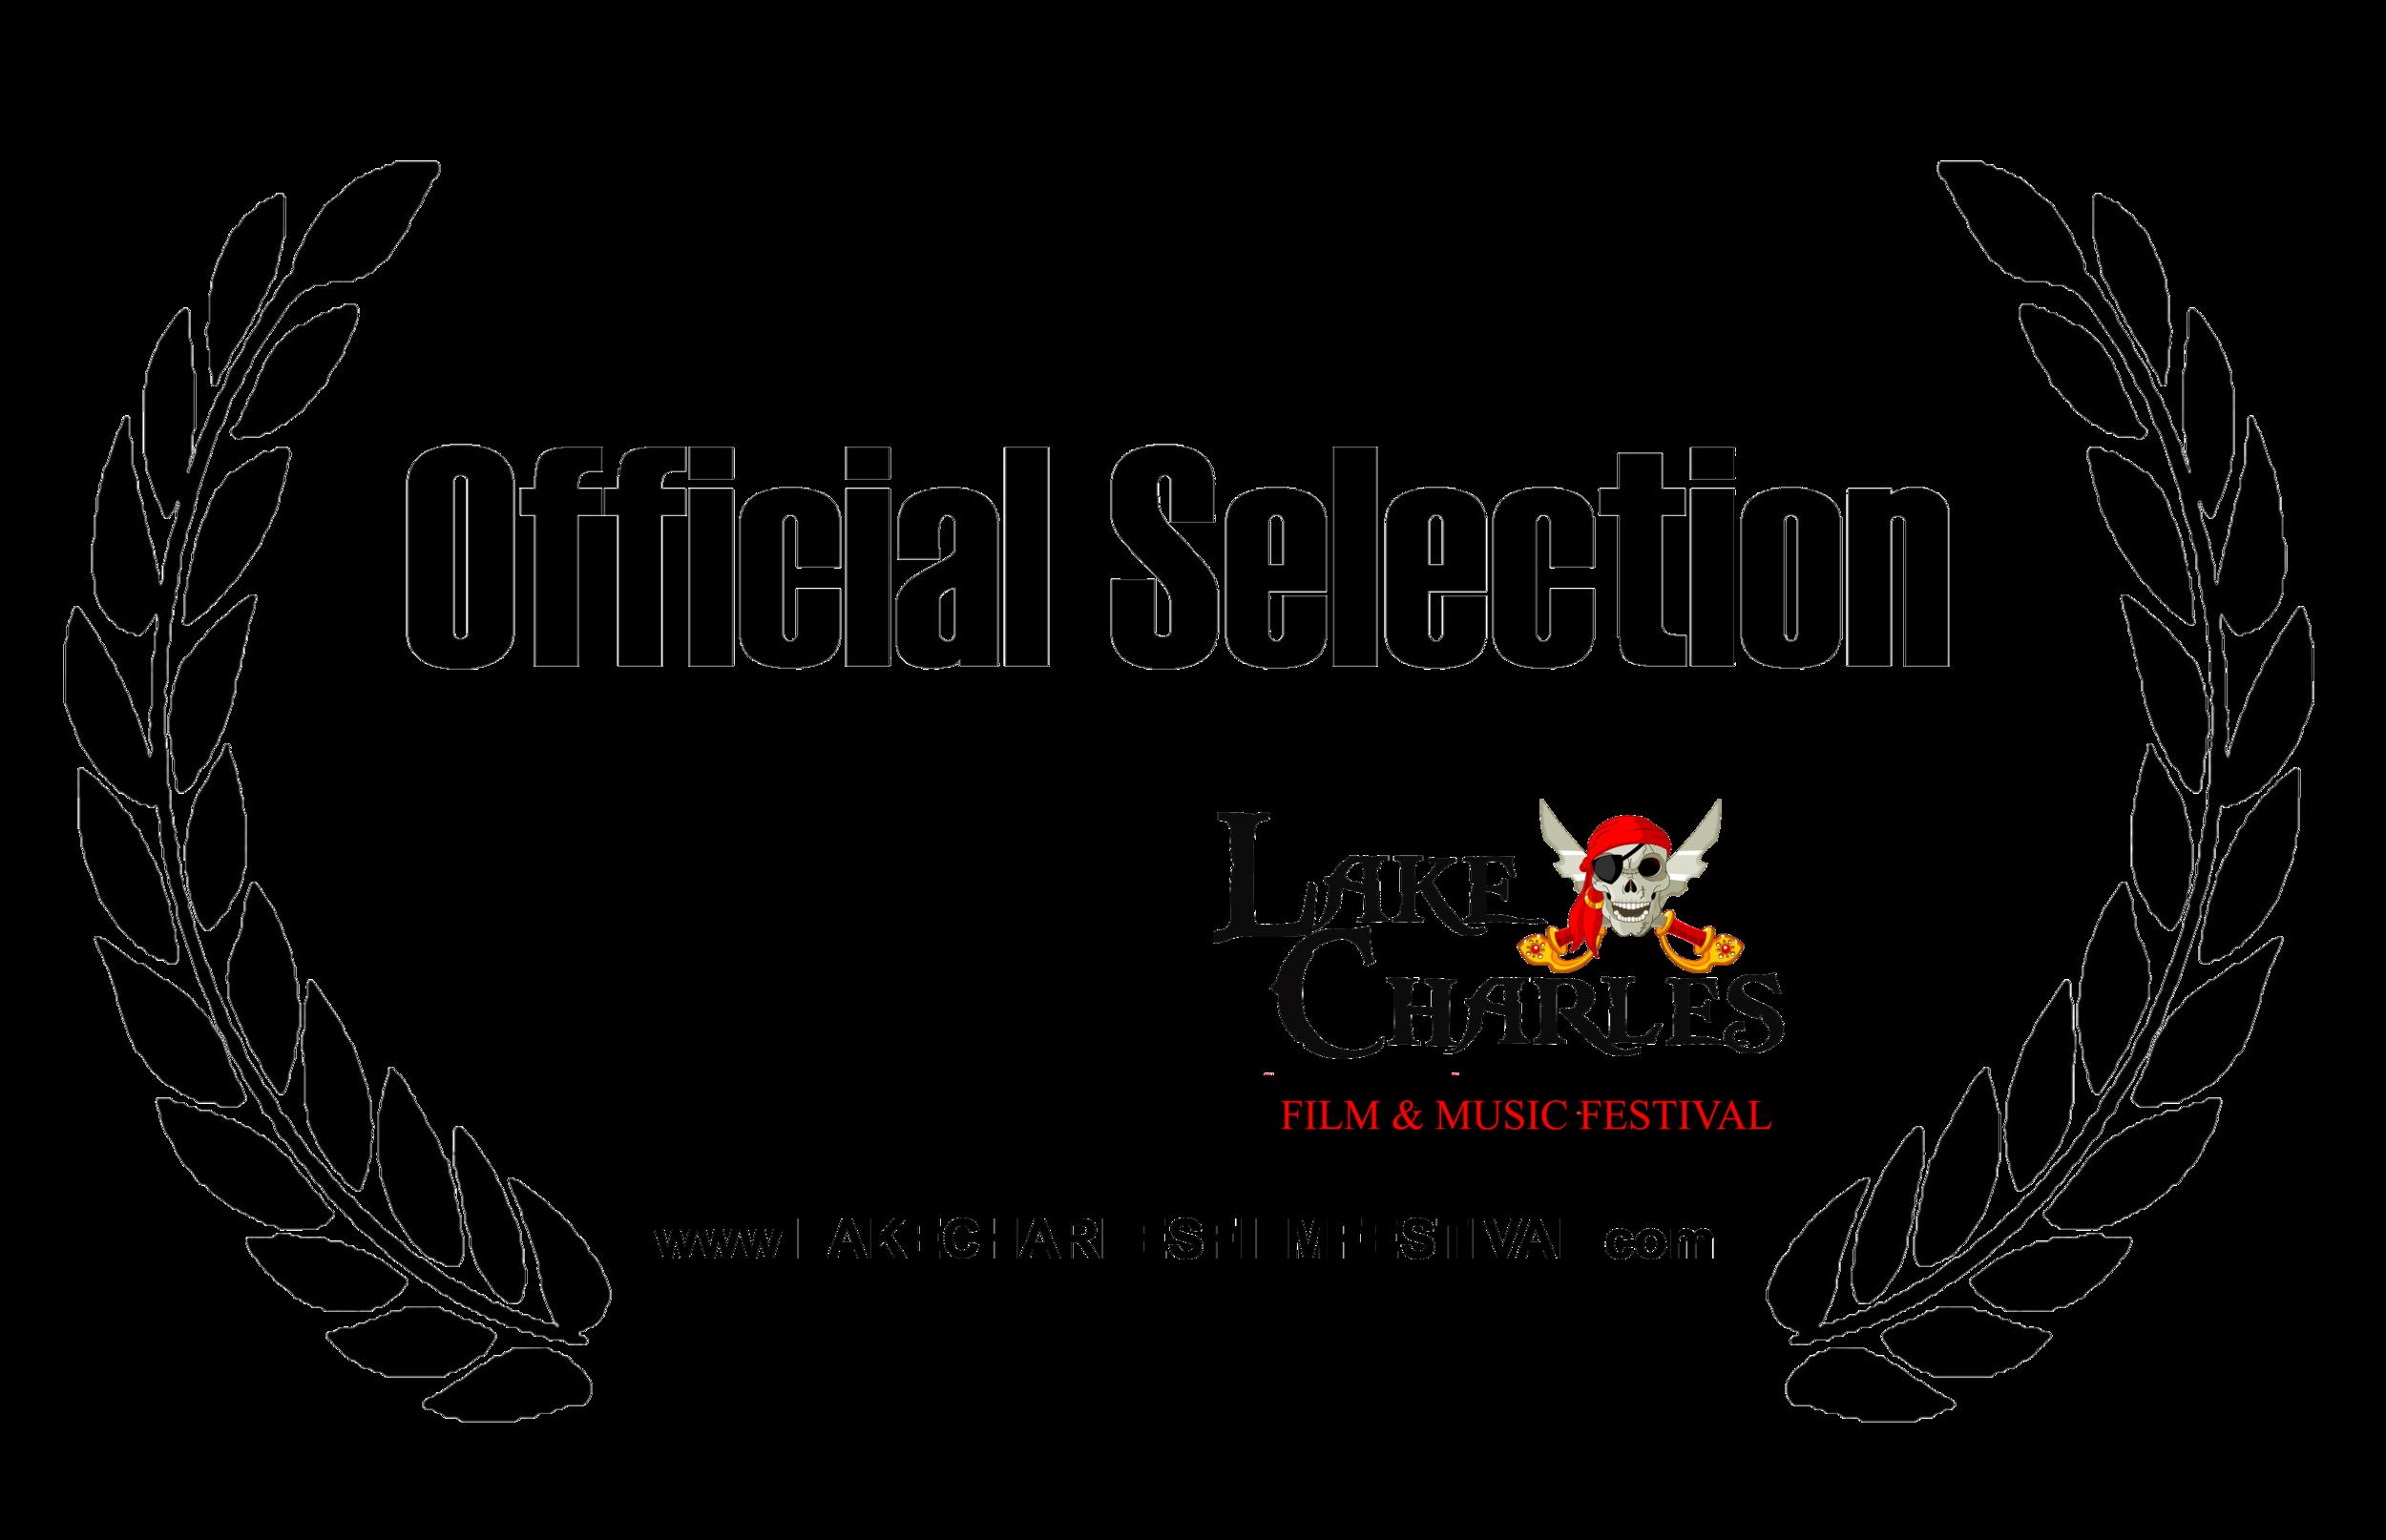 2018_official_selection_laurels.png